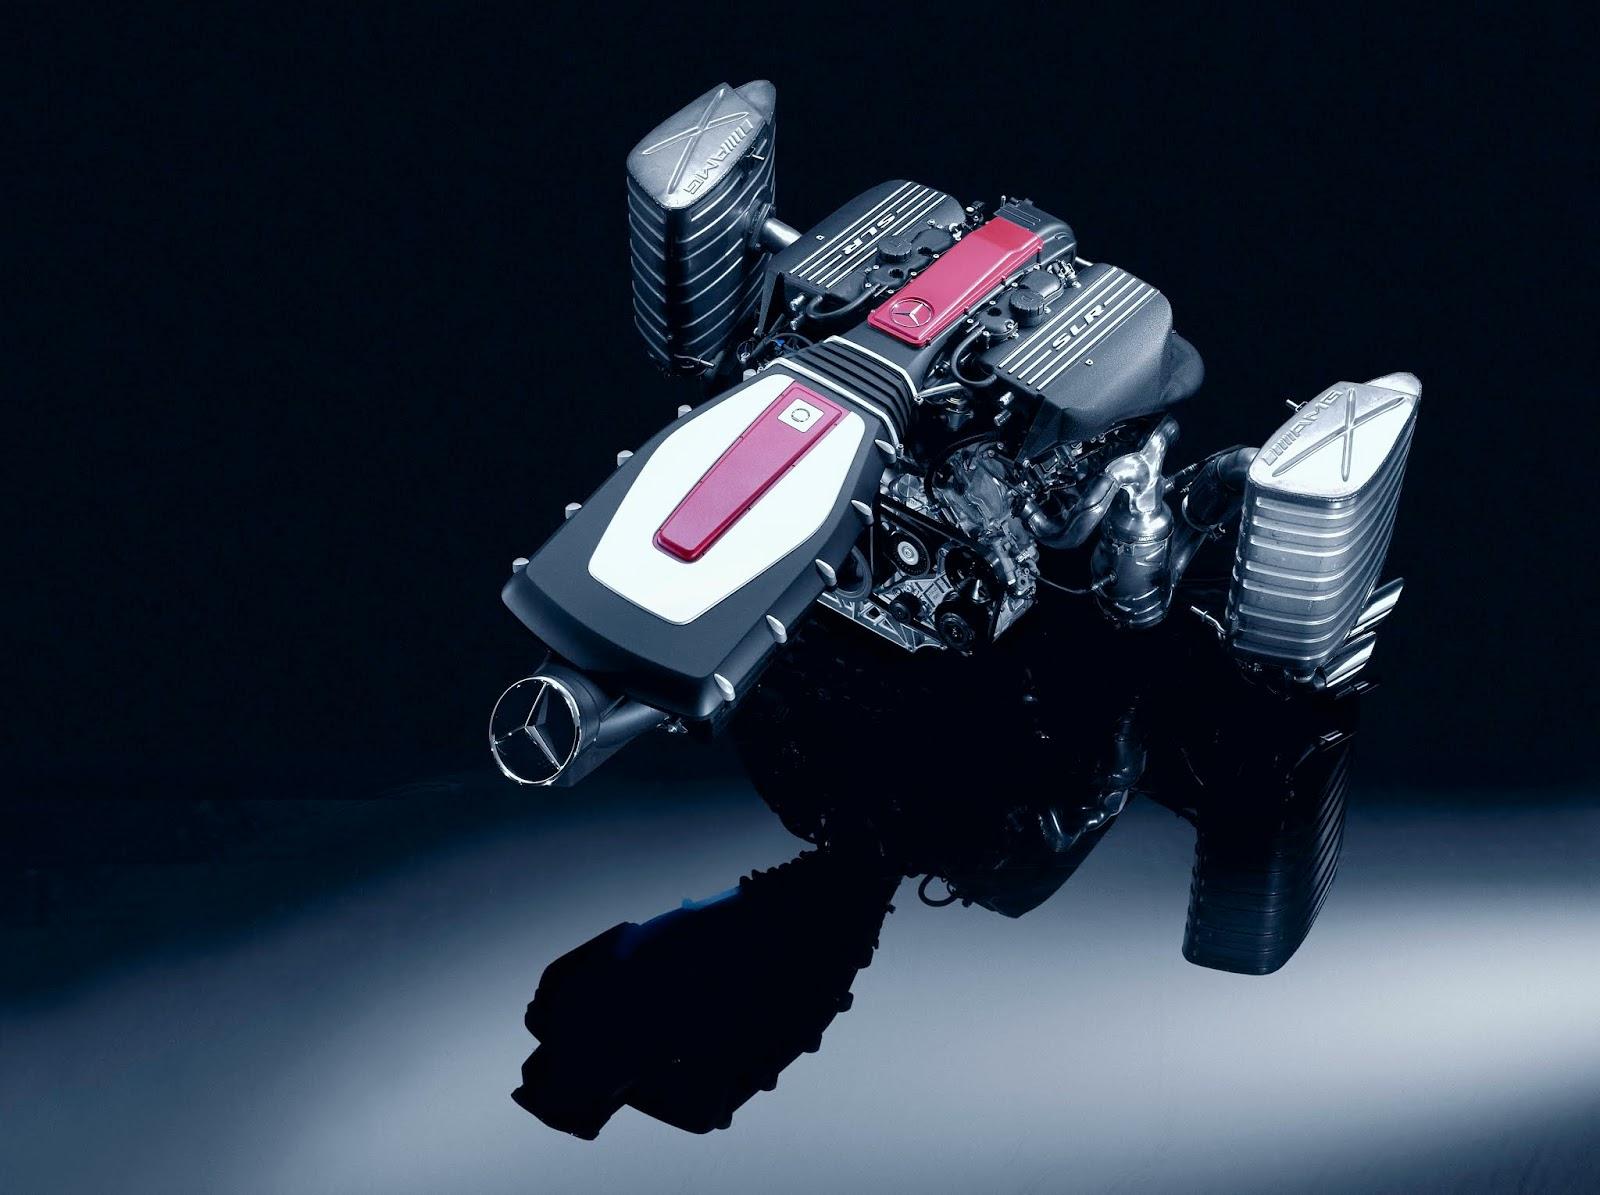 A2003F4423 Ποια είναι η θρυλική 300 SLR 300 SLR, Benz, Mercedes, Mercedes Benz, retrocar, retrocar sunday, vintage, zblog